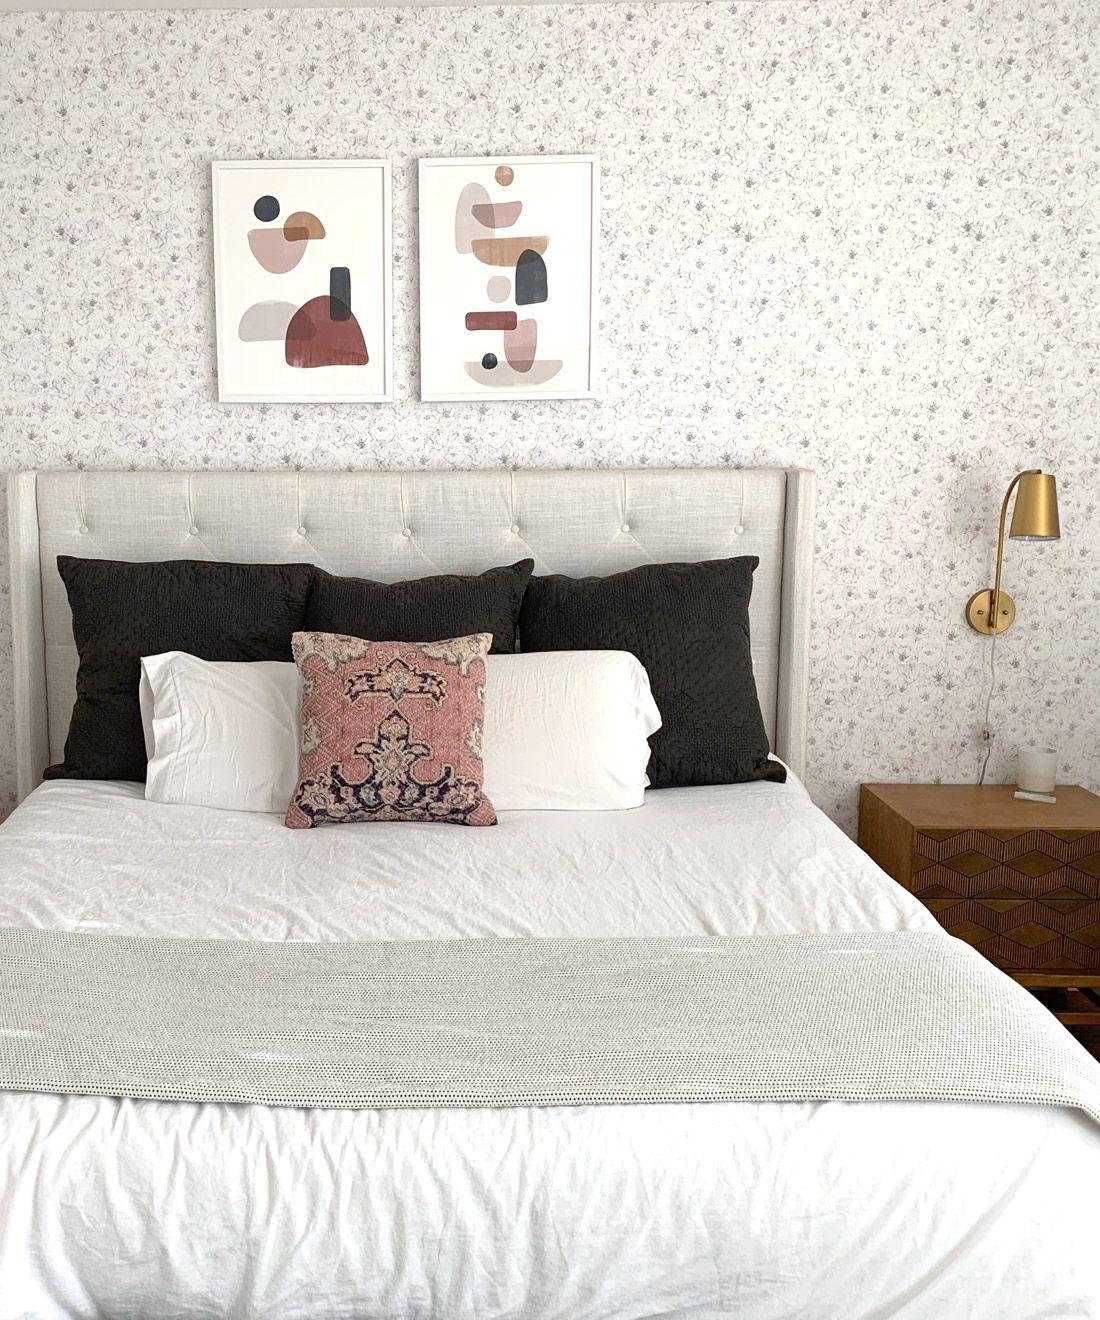 Peones & Anemones White Floral Wallpaper • Bedroom